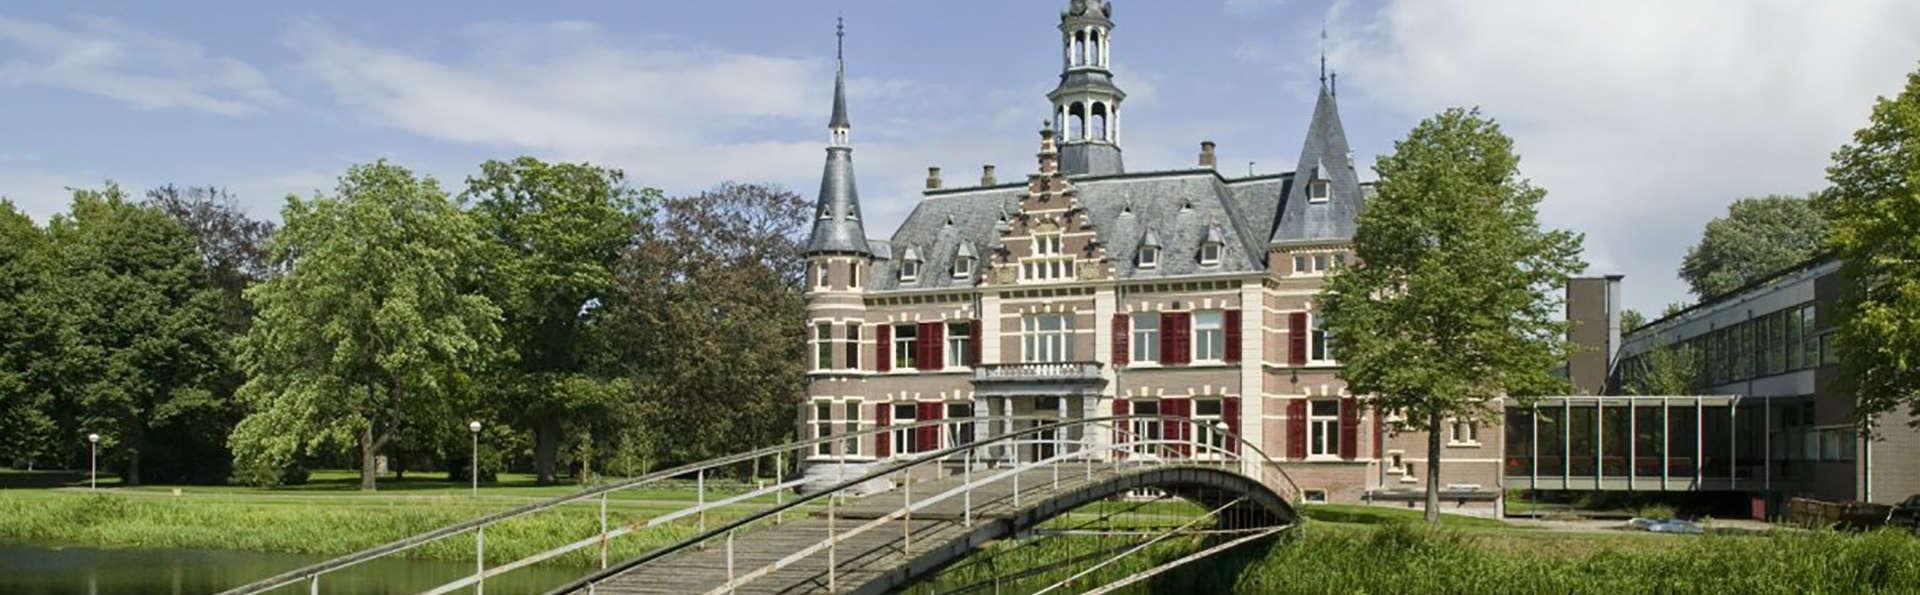 Explorez l'Actherhoek avec un maximum d'espace au Hof van Gelre